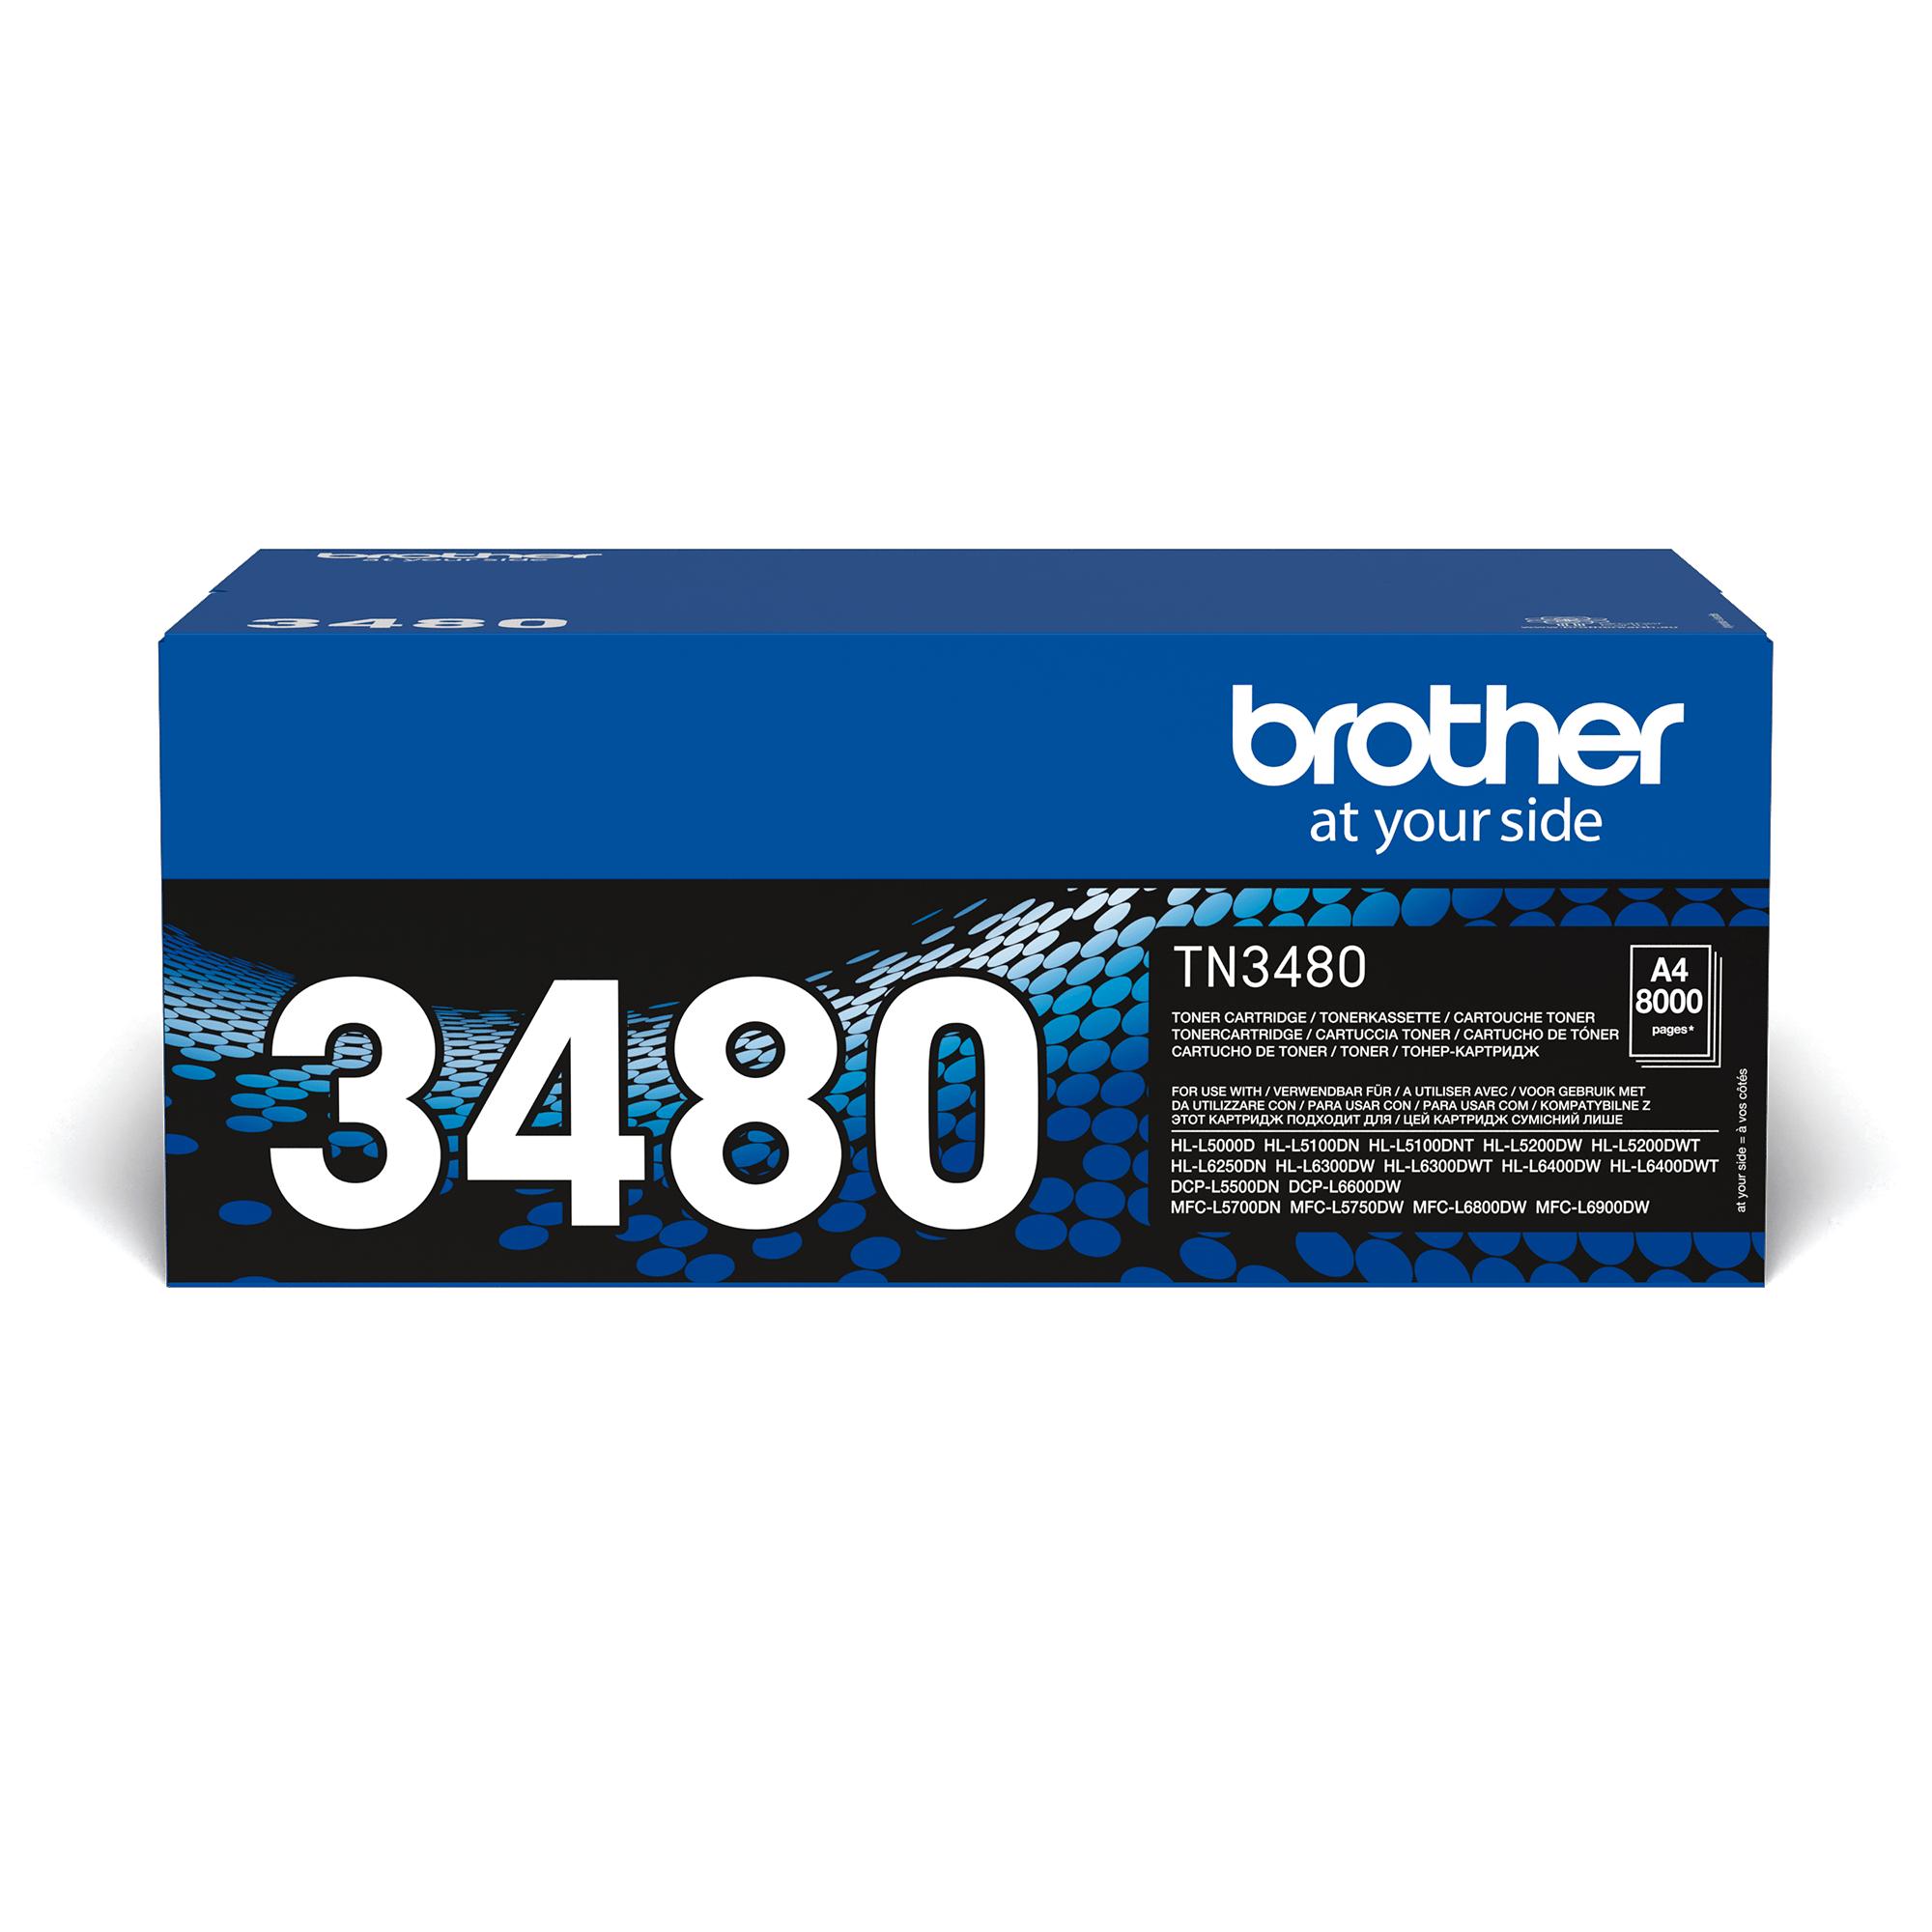 Genuine Brother TN-3480 Toner Cartridge – Black